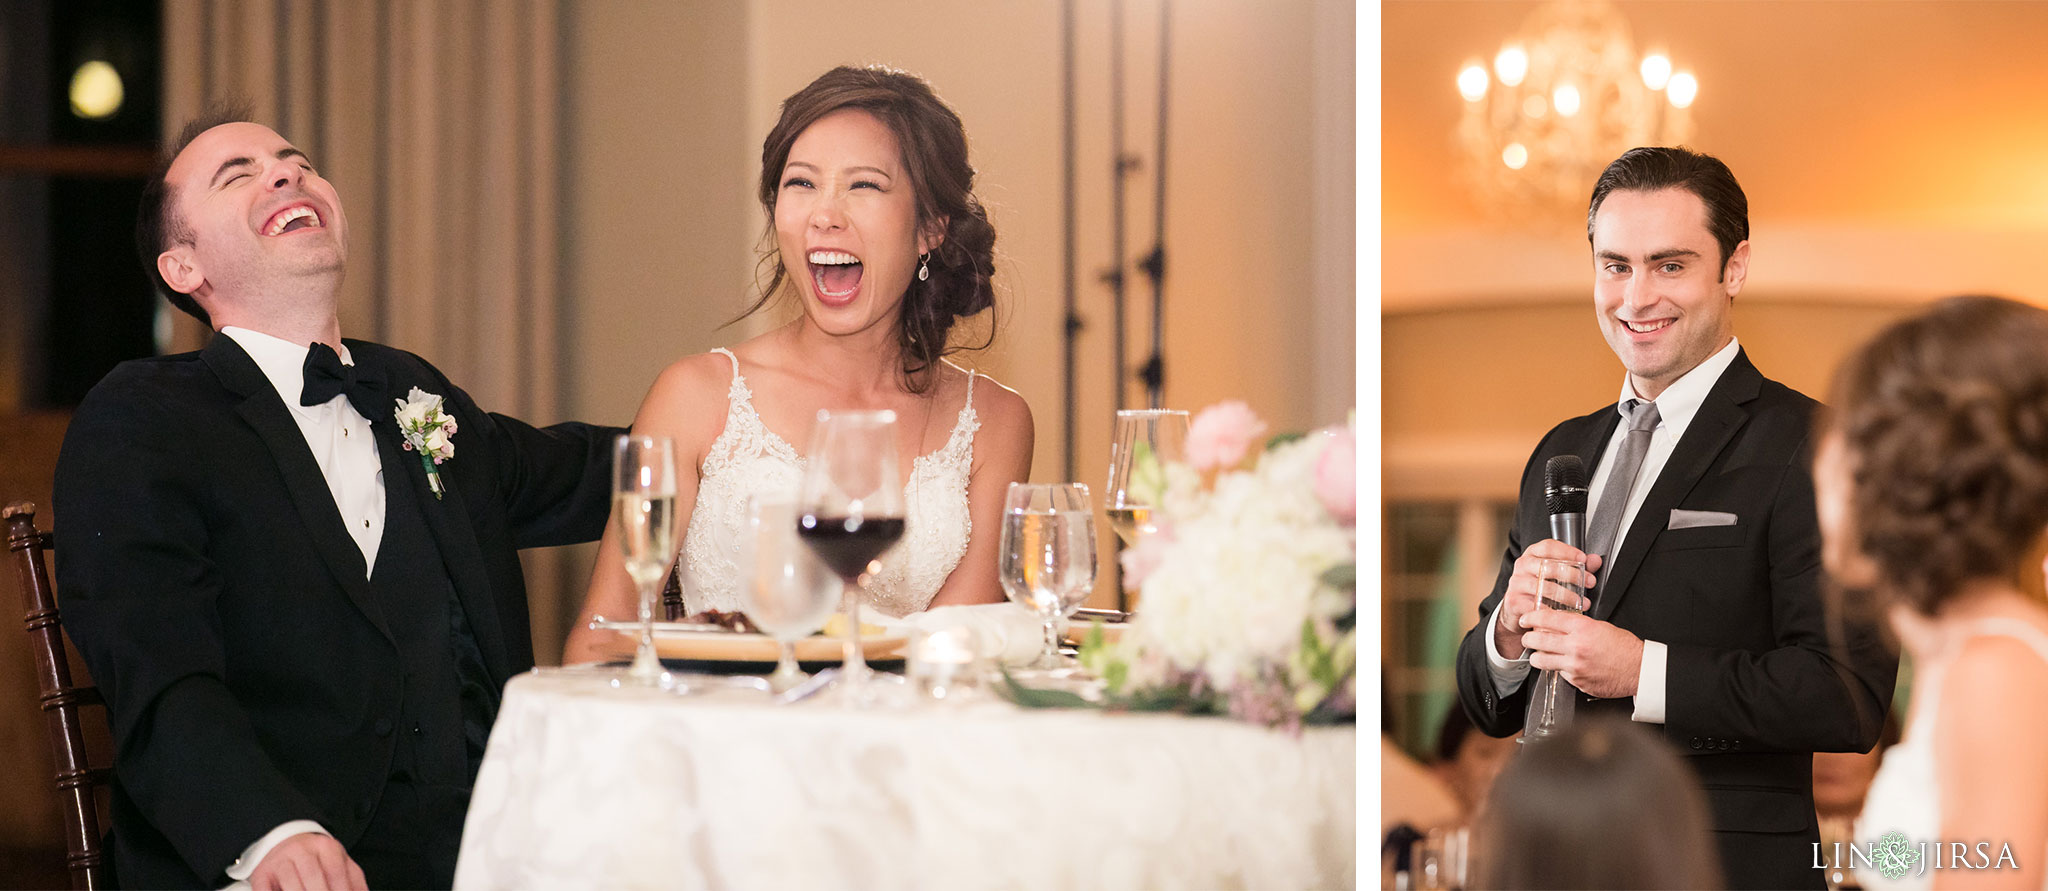 34 Ponte Winery Vineyard Garden Temecula Wedding Reception Photography